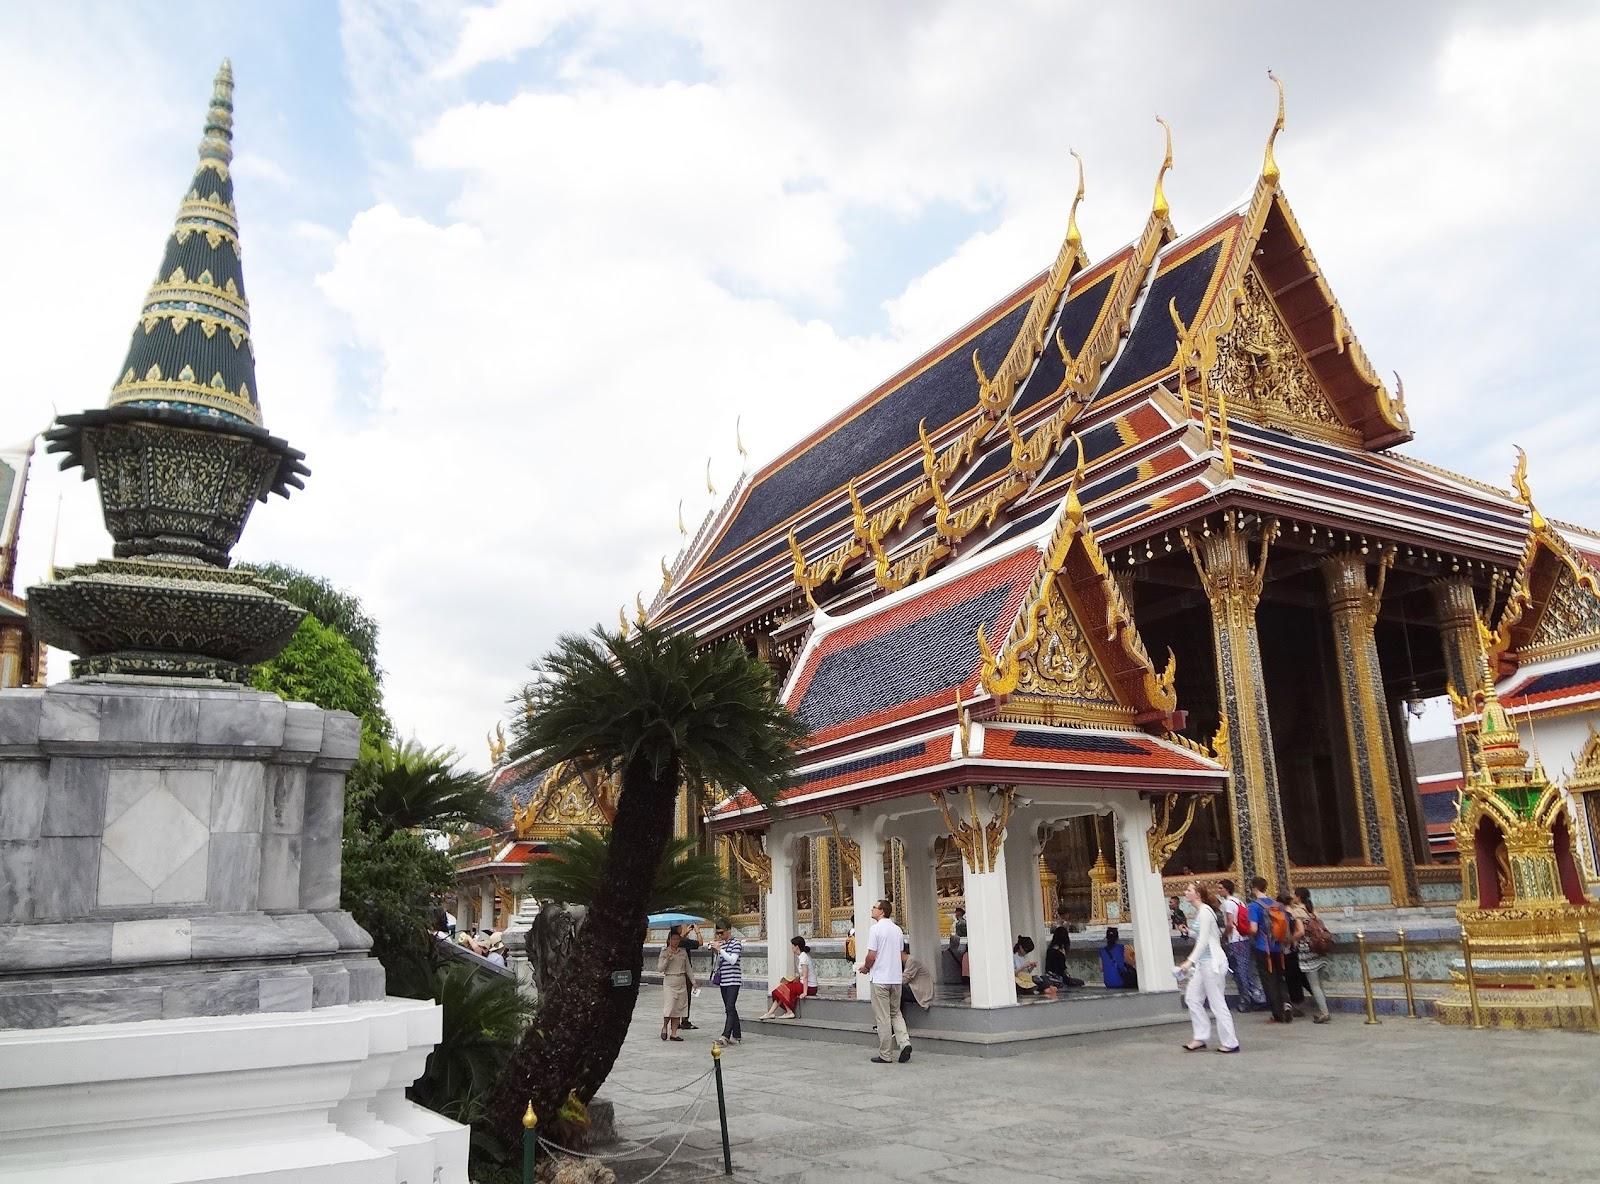 Jax Stumpes: Bangkok 6 Wat Phra Kaew & Grand Palace (6/25/2012)